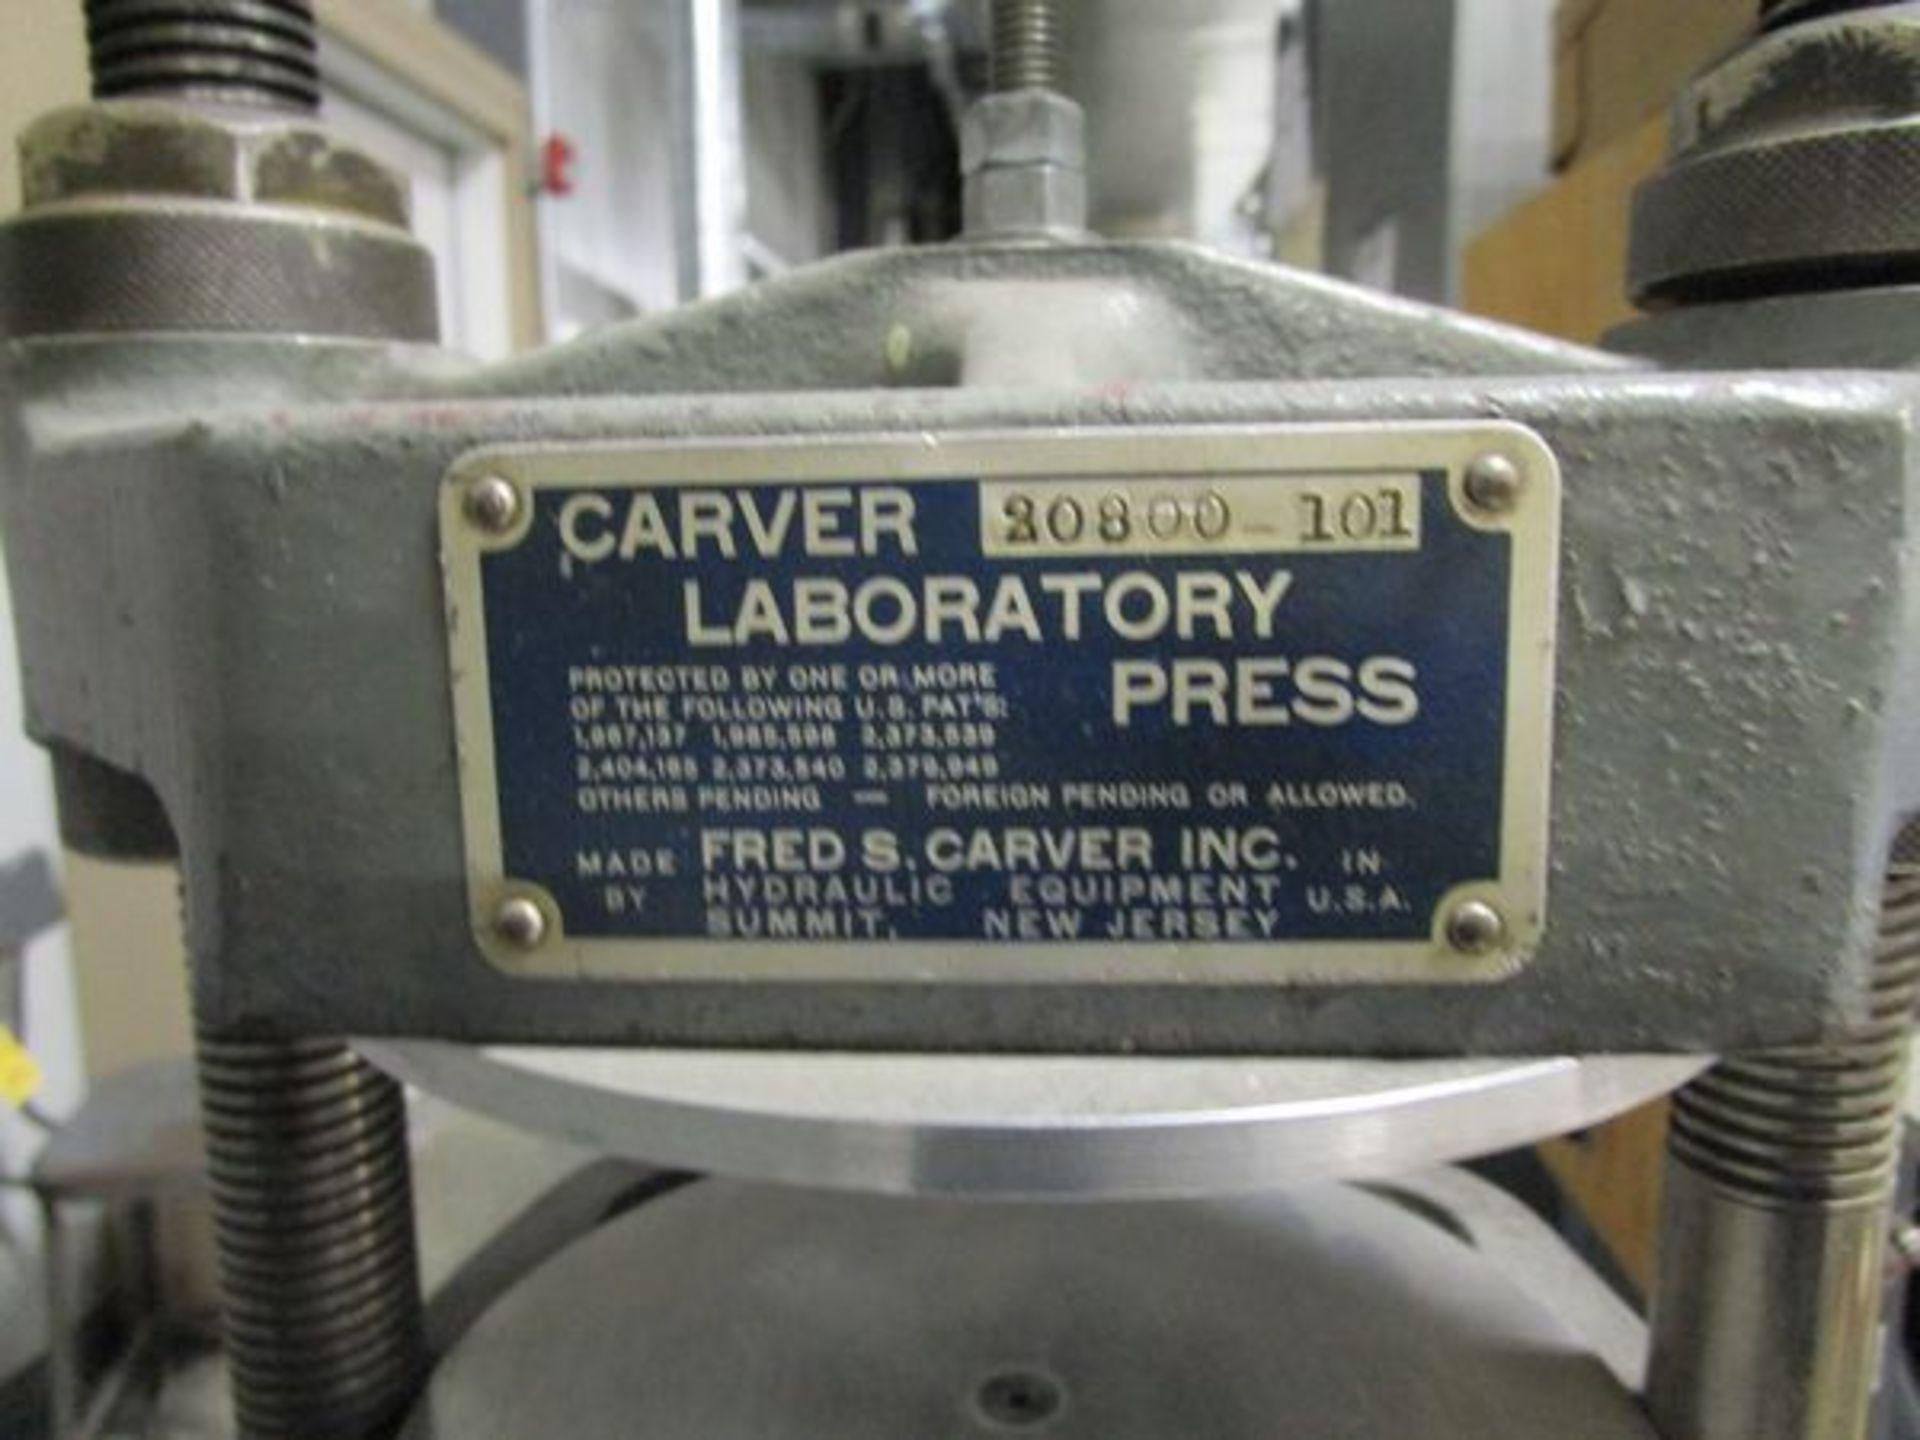 Carver 20800-101 Laboratory Press - Image 2 of 2